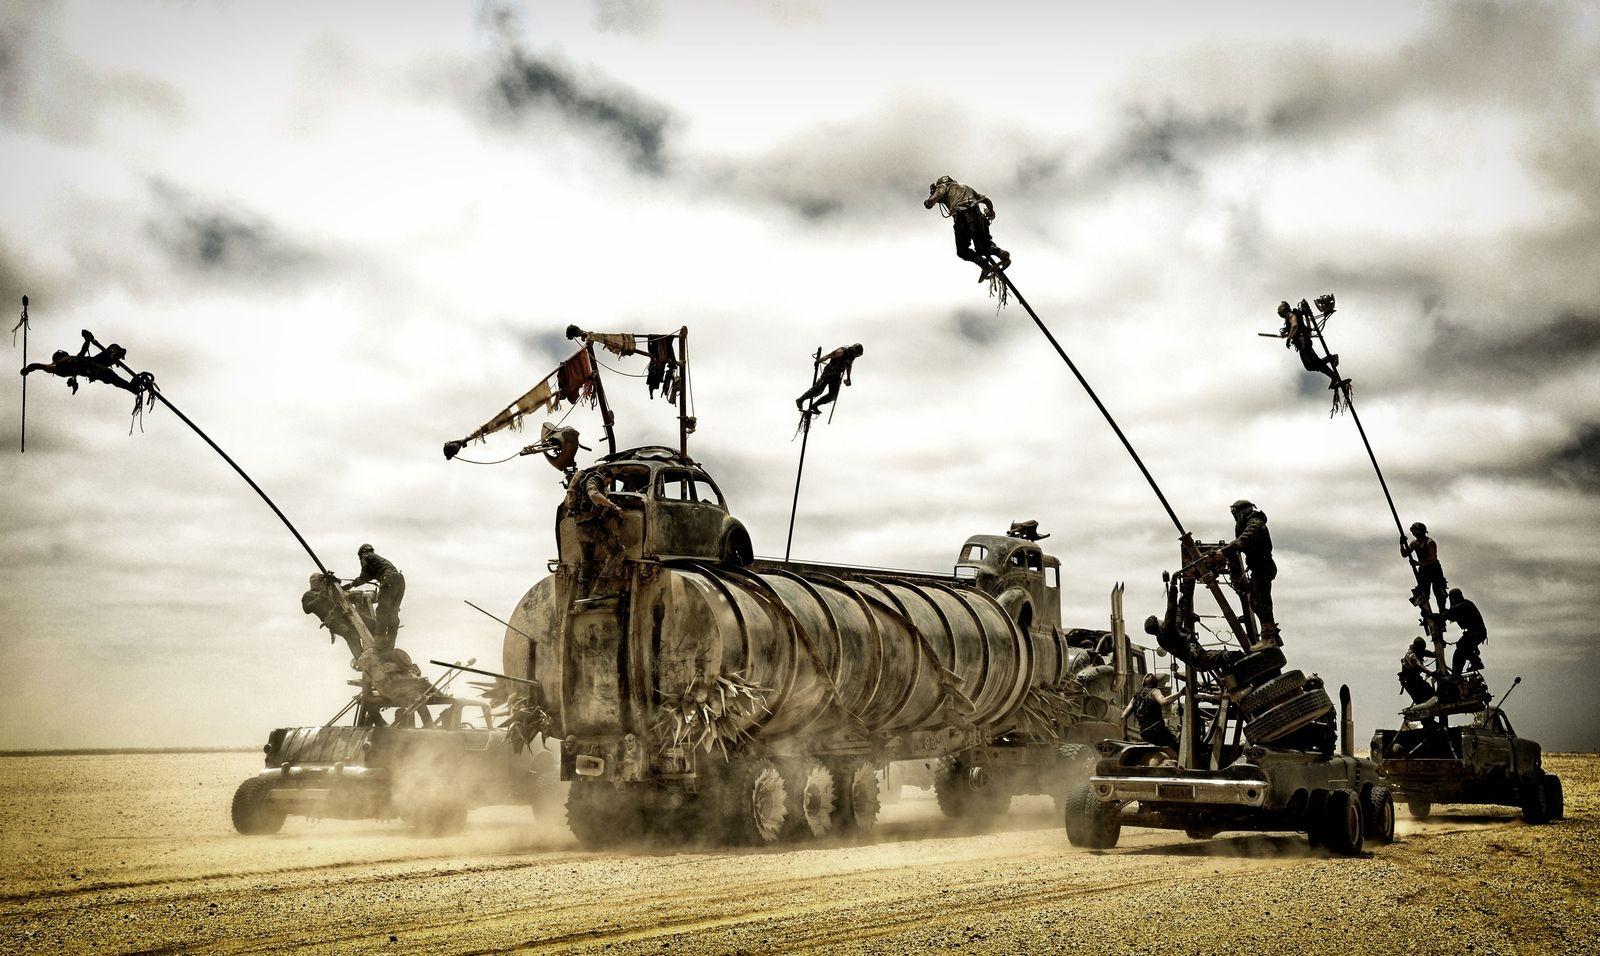 mad-max-fury-road-image-the-war-rig